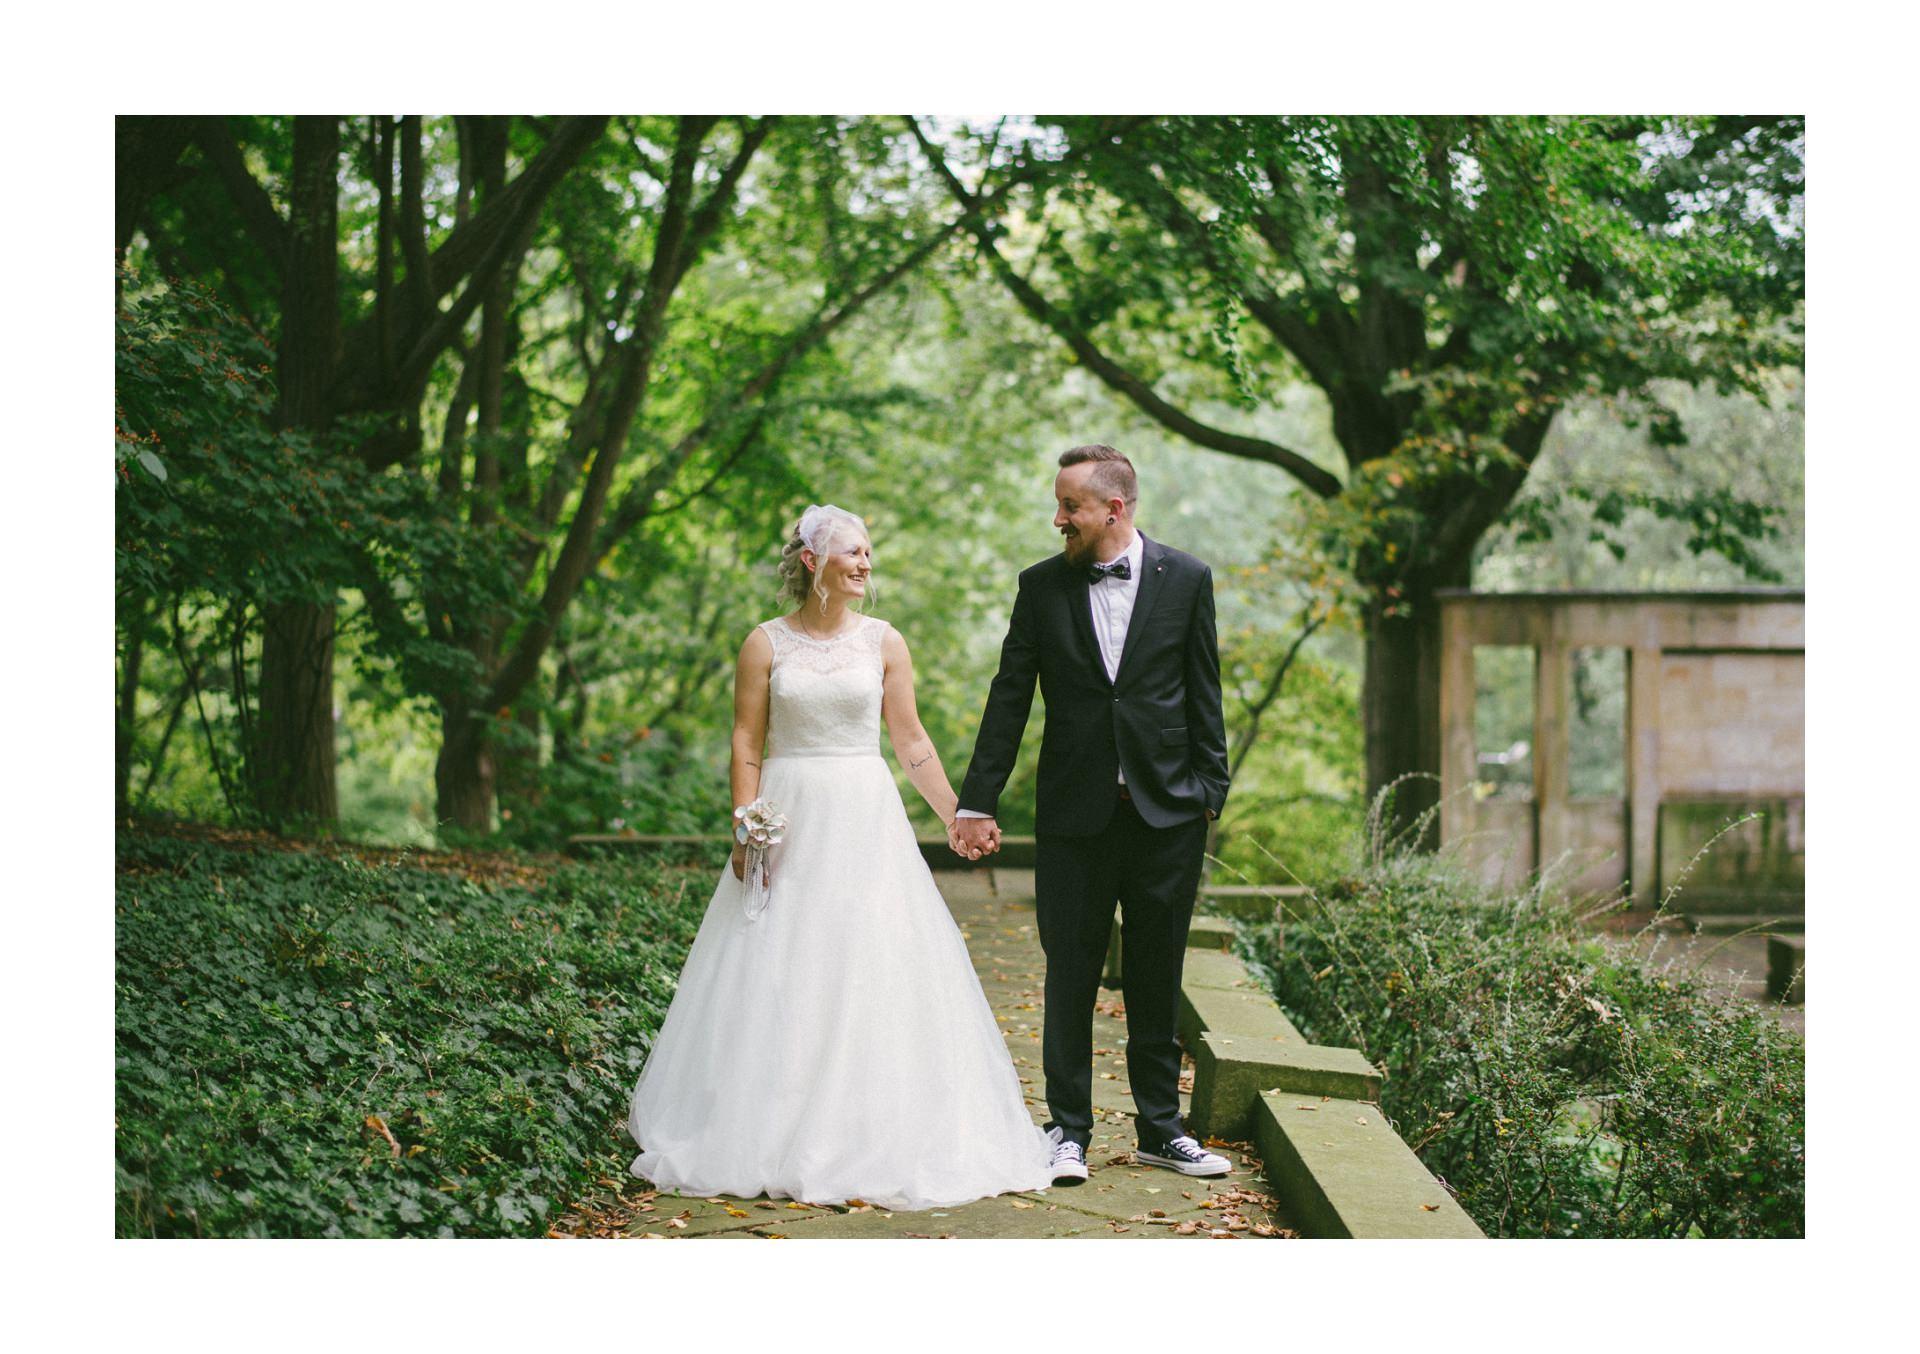 Goldhorn Brewery Wedding Photos in Cleveland 1 44.jpg